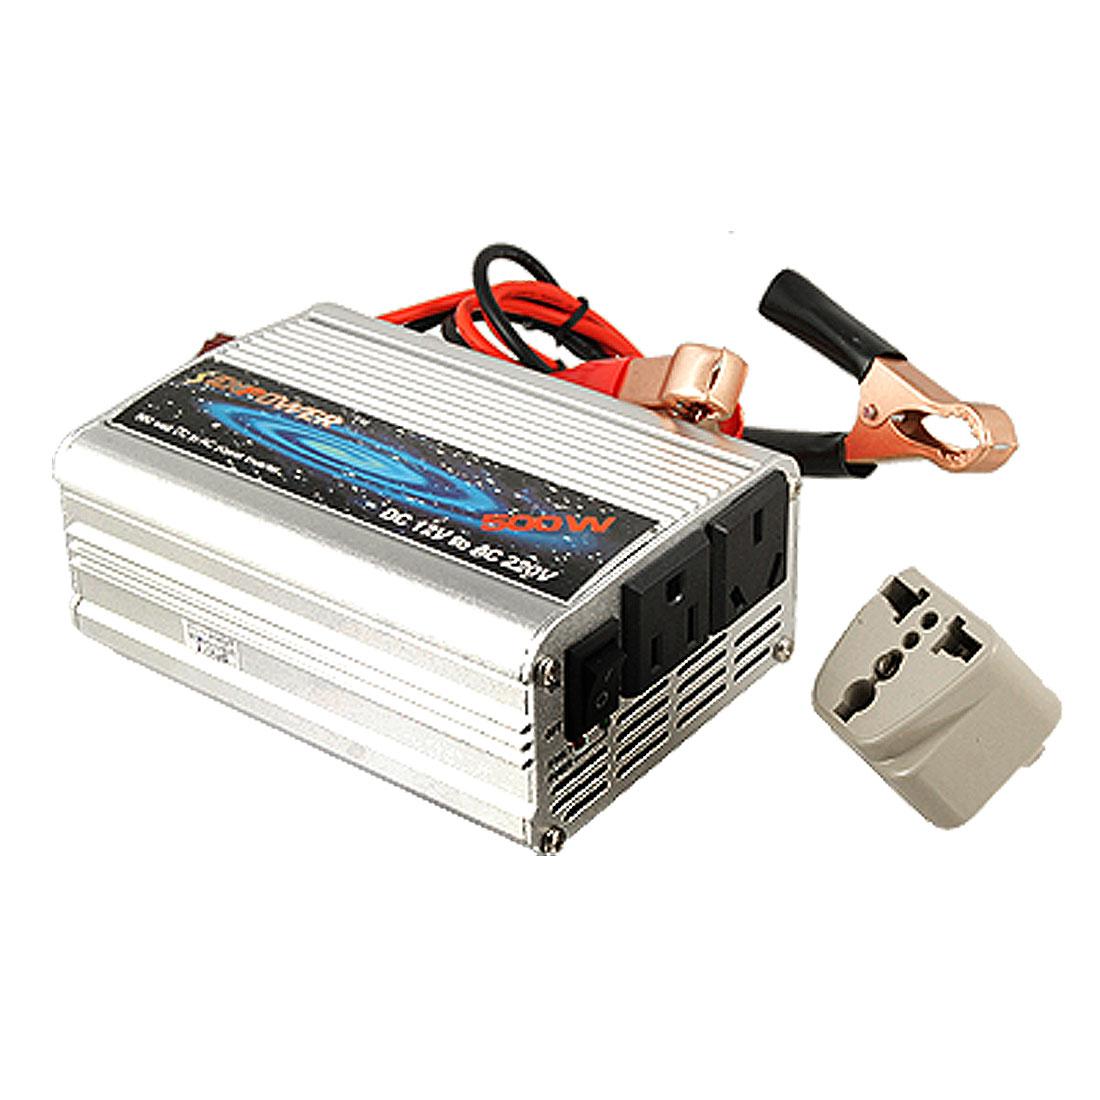 Auto Car DC 12V to AC 220V Power Inverter Adapter 500W